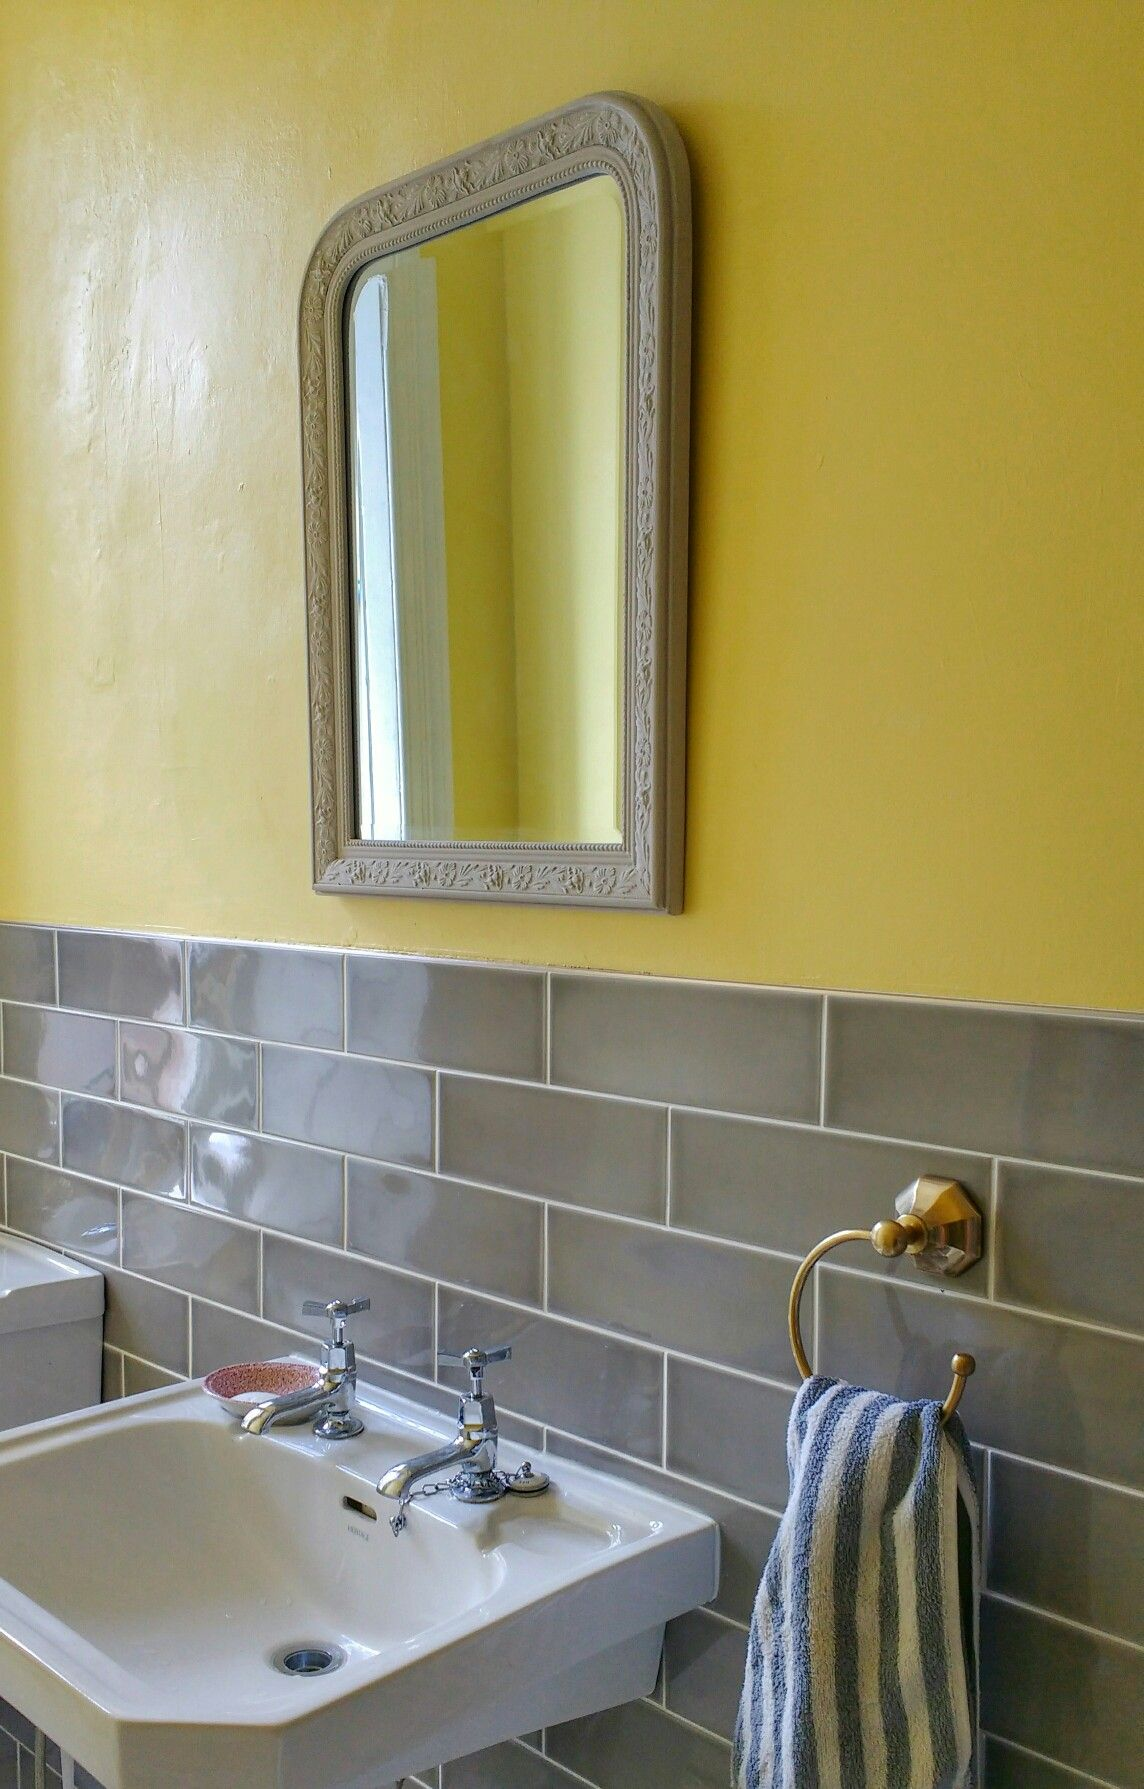 Bathroom Mirrors Glasgow our new glasgow tenement bathroom: grey subway tiles, yellow walls